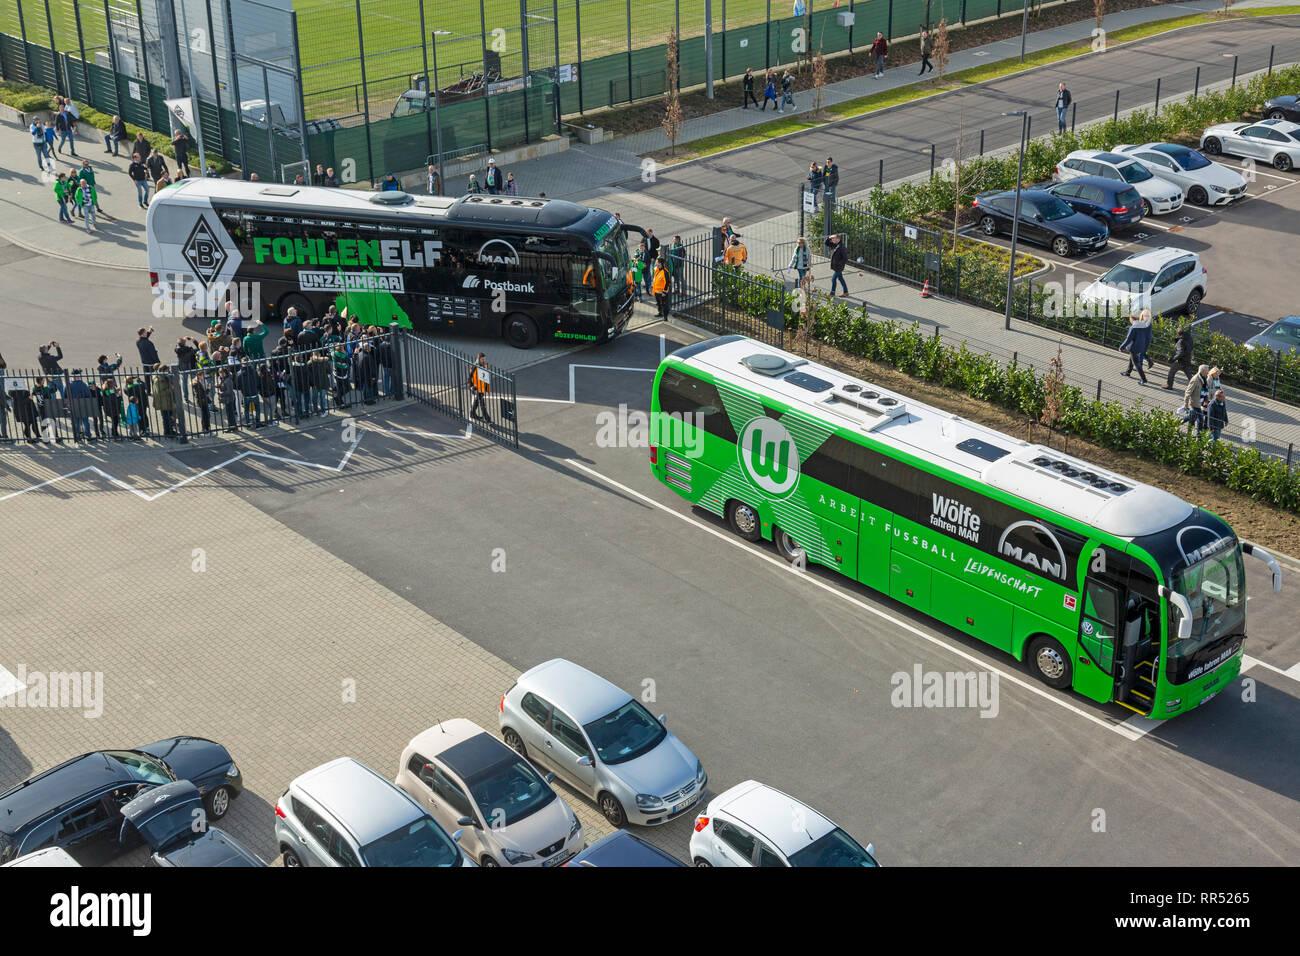 sports, football, Bundesliga, 2018/2019, Borussia Moenchengladbach vs VfL Wolfsburg 0-3, Stadium Borussia Park, team busses of Wolfsburg and Gladbach, DFL REGULATIONS PROHIBIT ANY USE OF PHOTOGRAPHS AS IMAGE SEQUENCES AND/OR QUASI-VIDEO - Stock Image